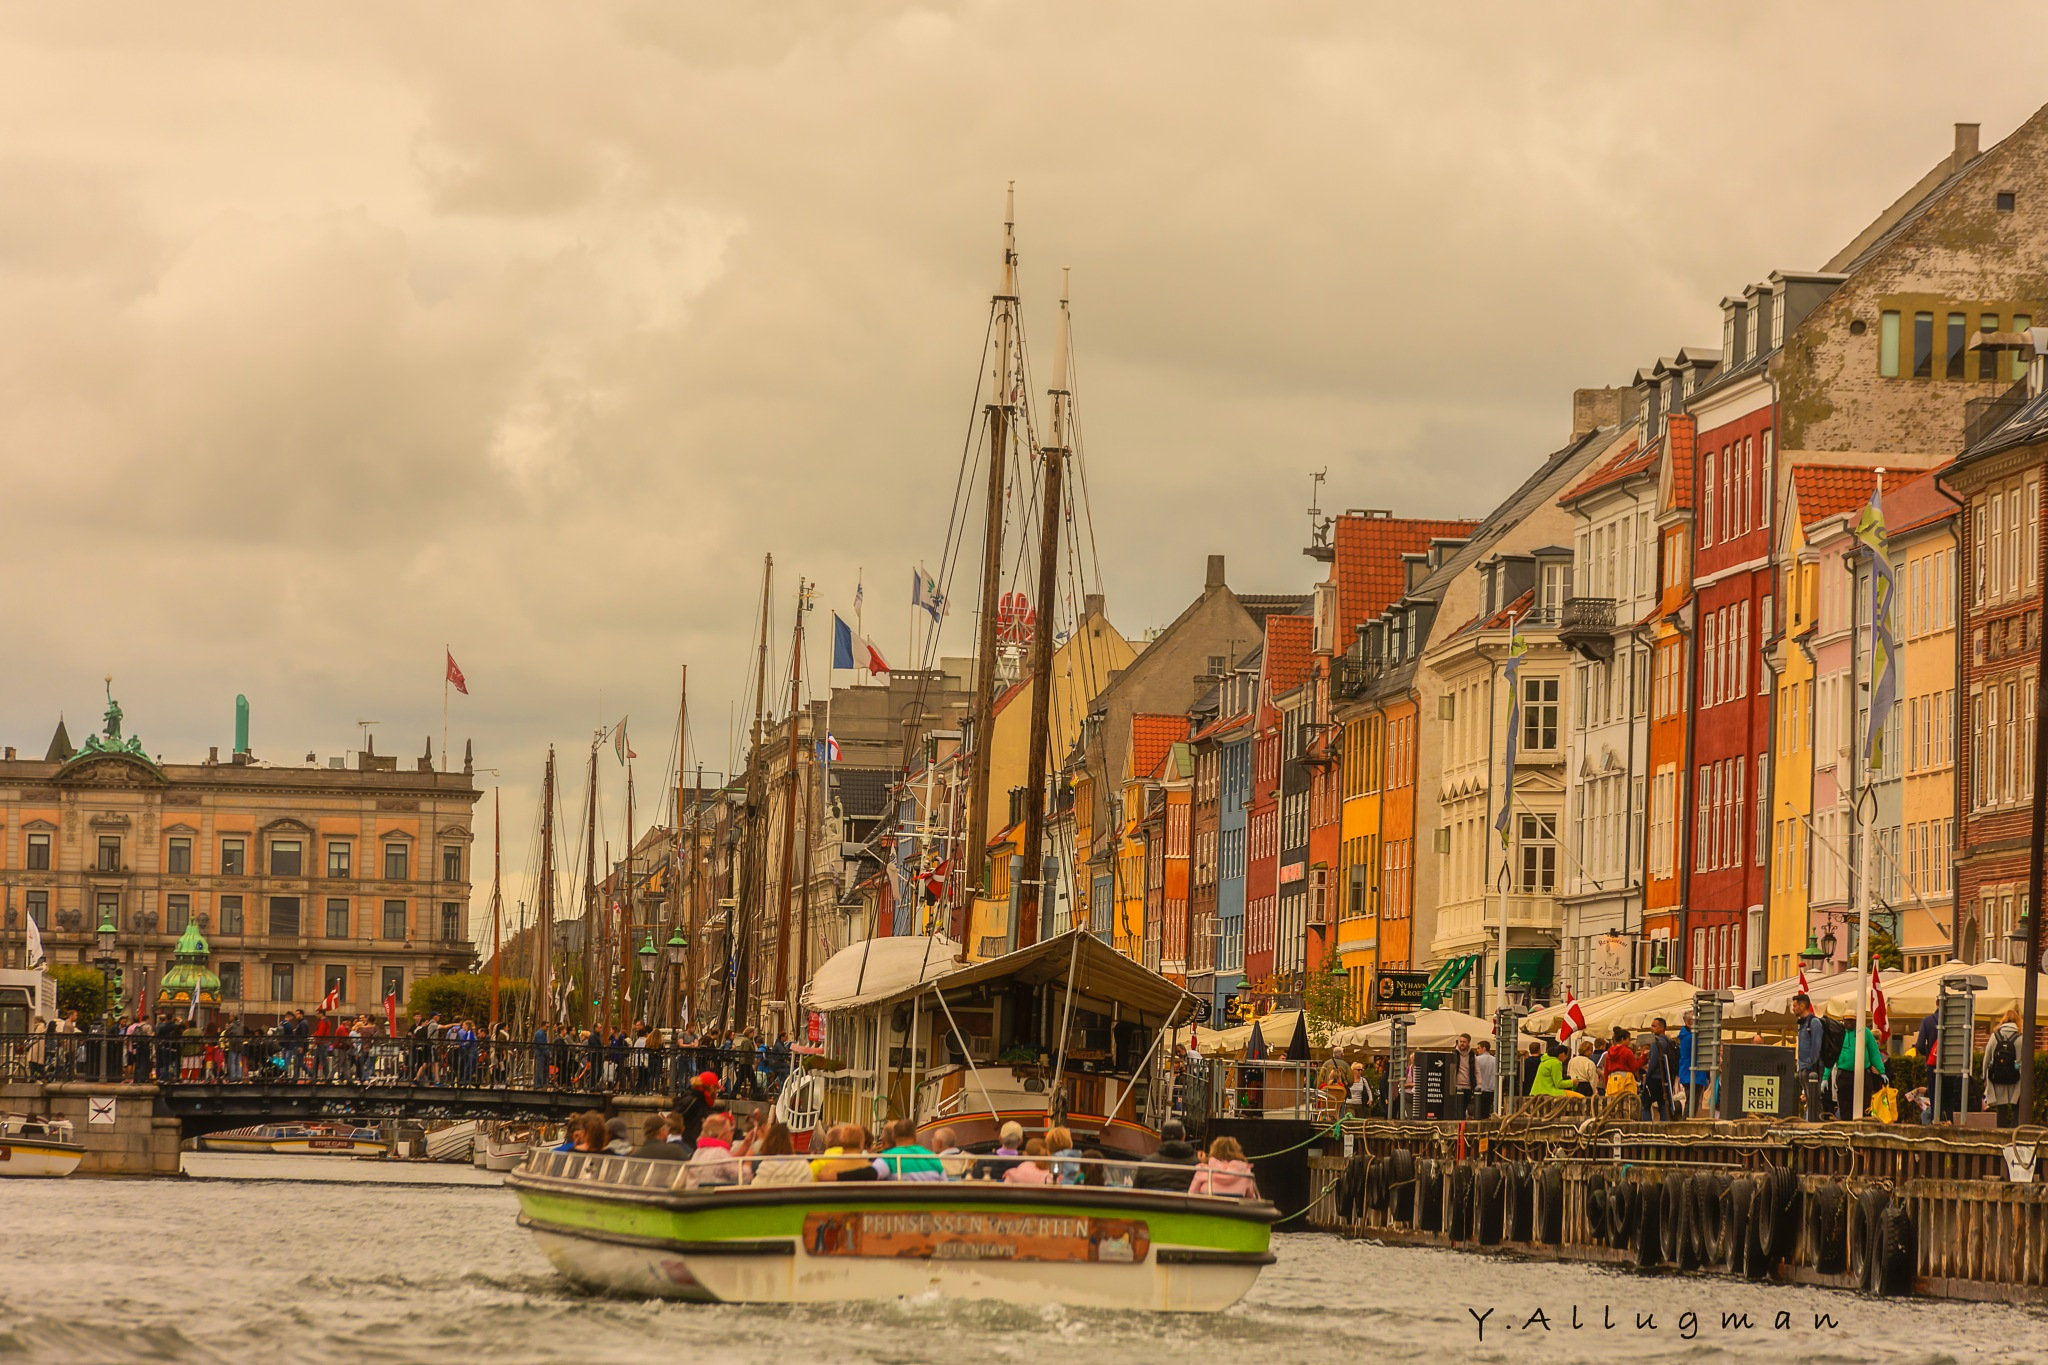 Copenhagen, Denmark - 3 by Y.Allugman